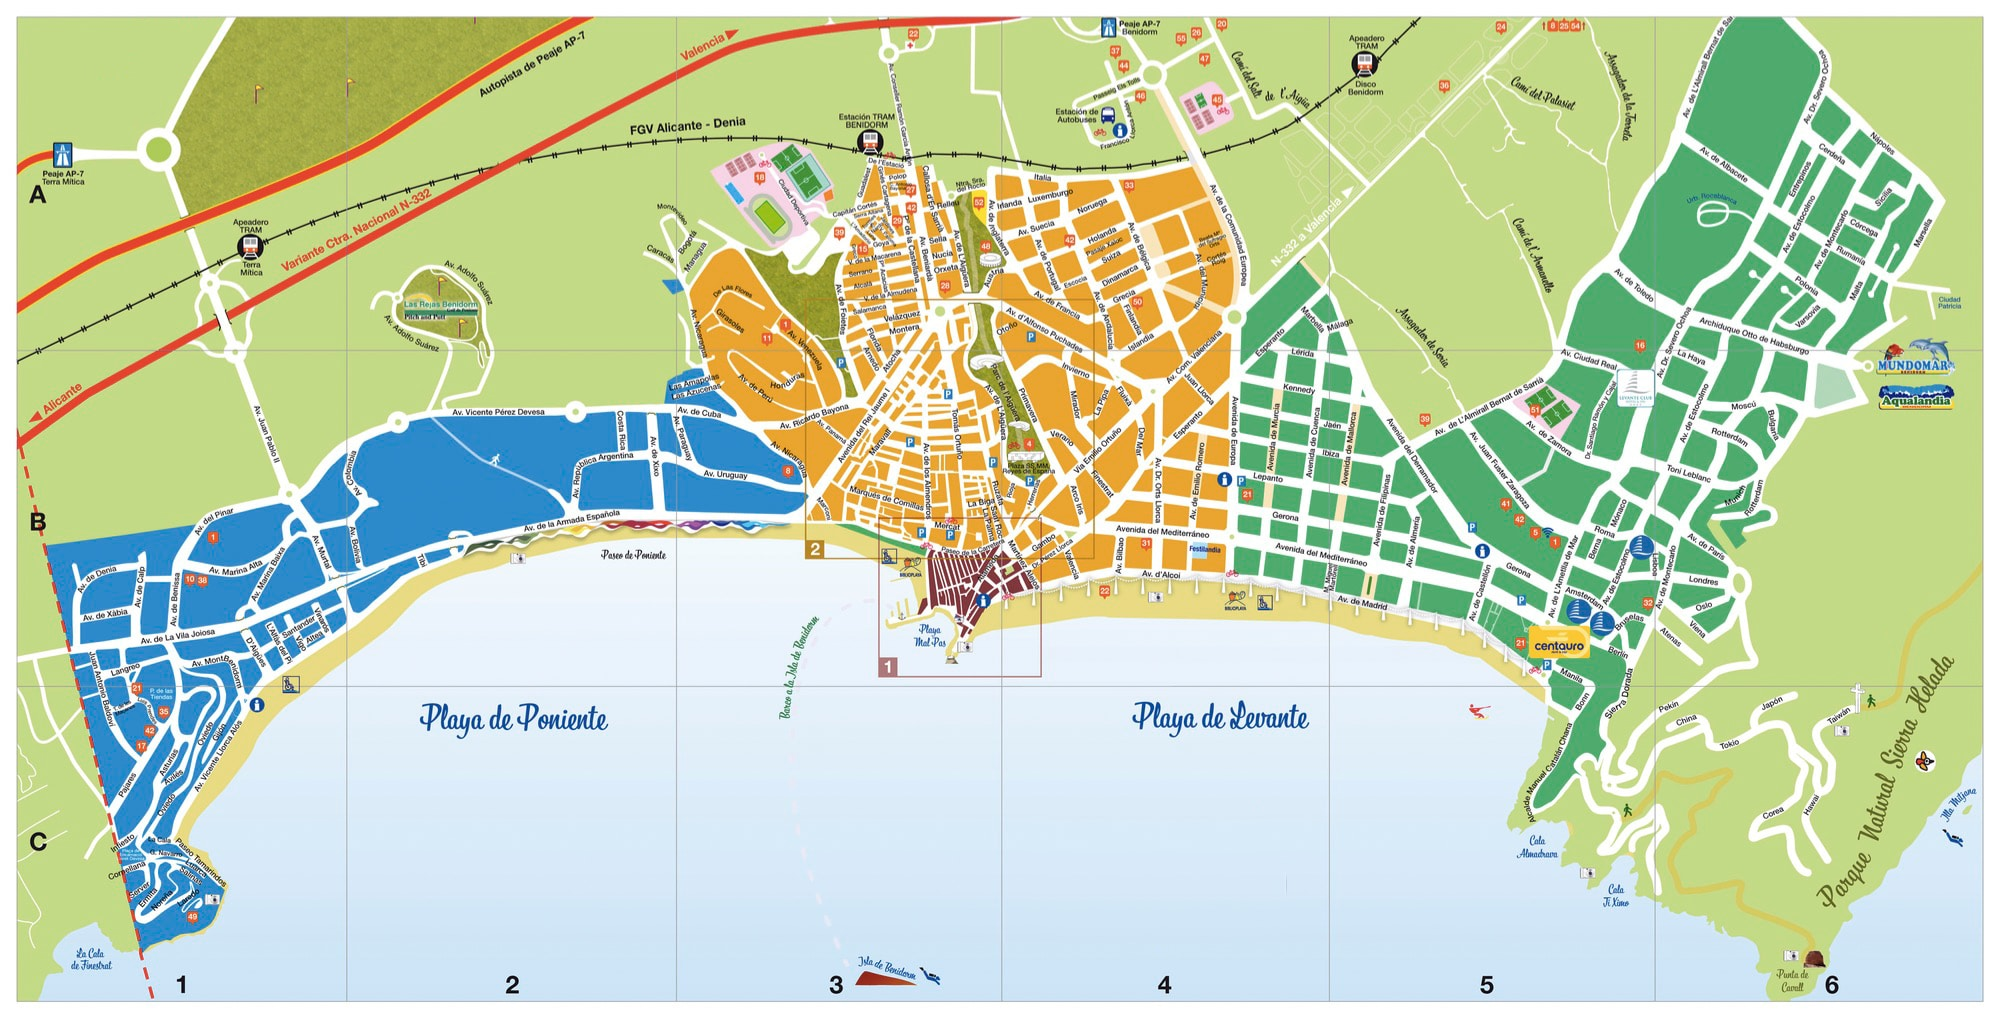 Rincon De Loix Mapa.The 10 Best Plans To Do In Benidorm Arena Blanca Blog